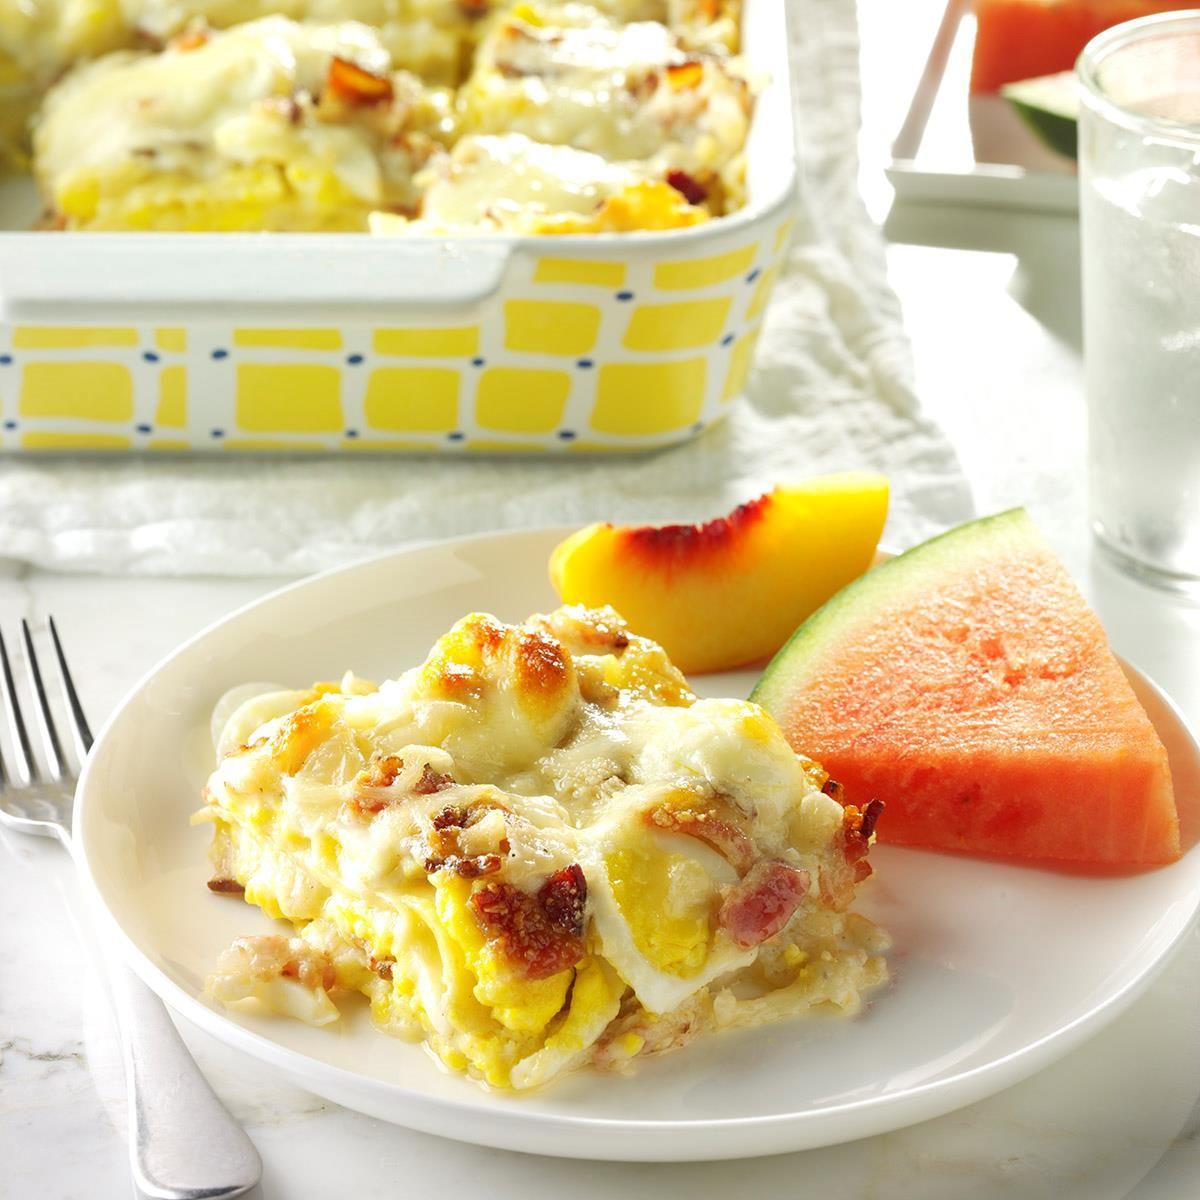 Bacon-n-Egg-Lasagna_EXPS_BMZ17_12009_D09_30_4b.jpg